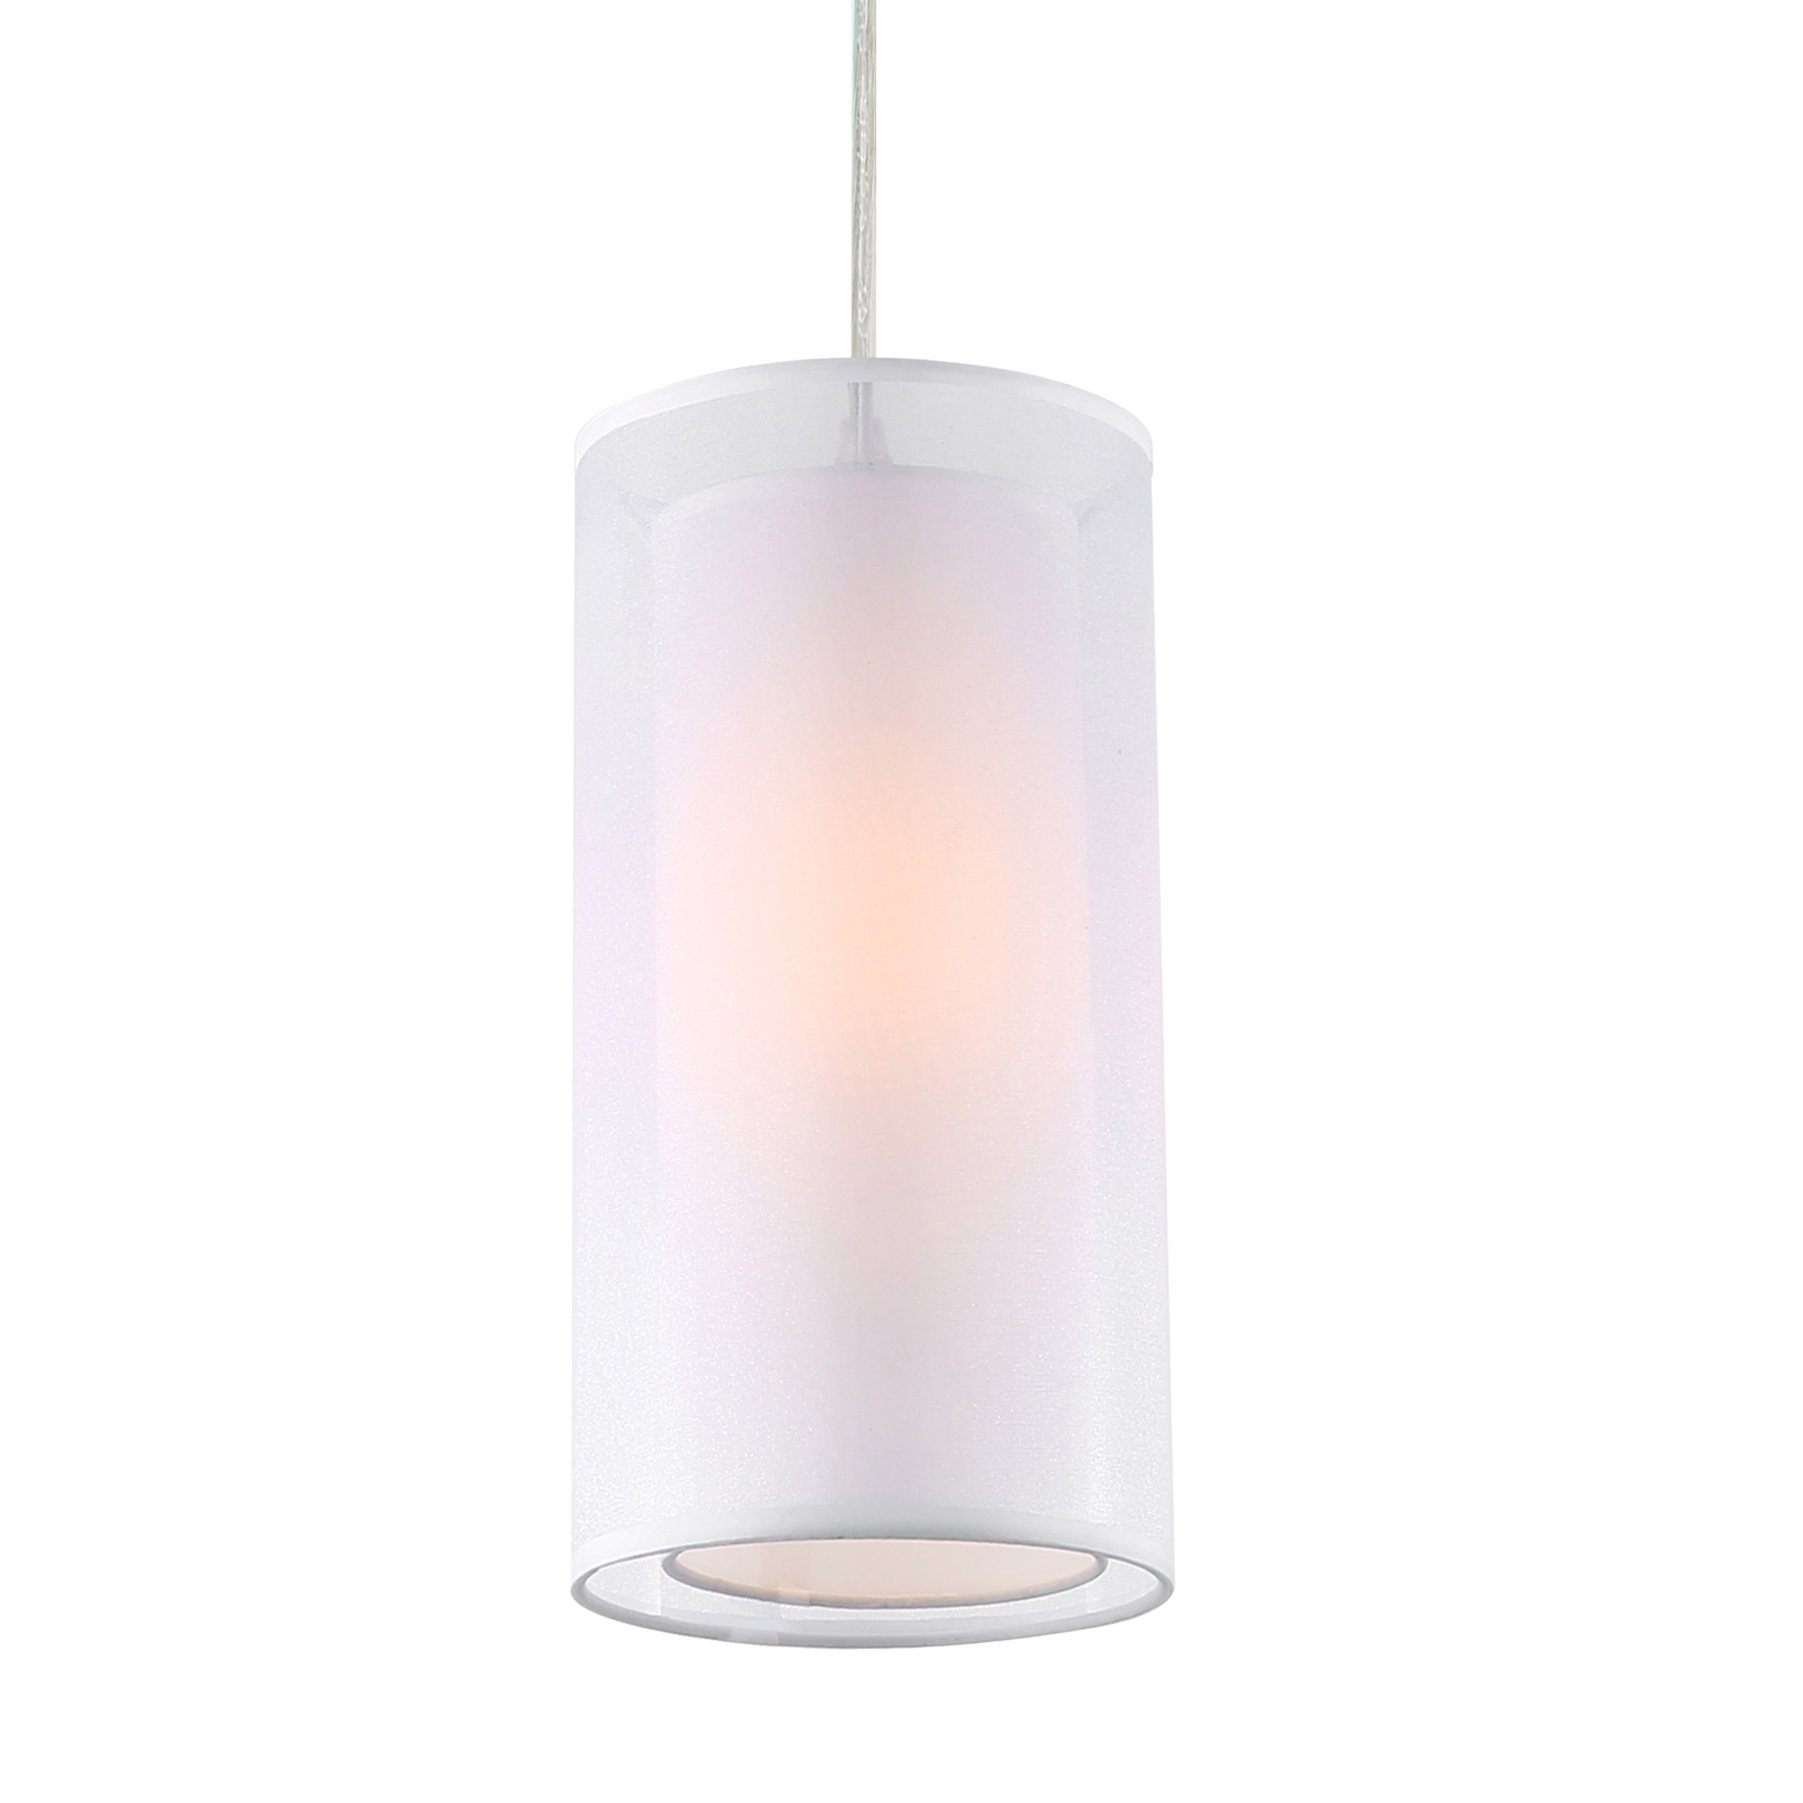 Light Society Medio Cylindrical Pendant Light, White Double Fabric Shade, Contemporary Minimalist Modern Lighting Fixture (LS-C240-WH)